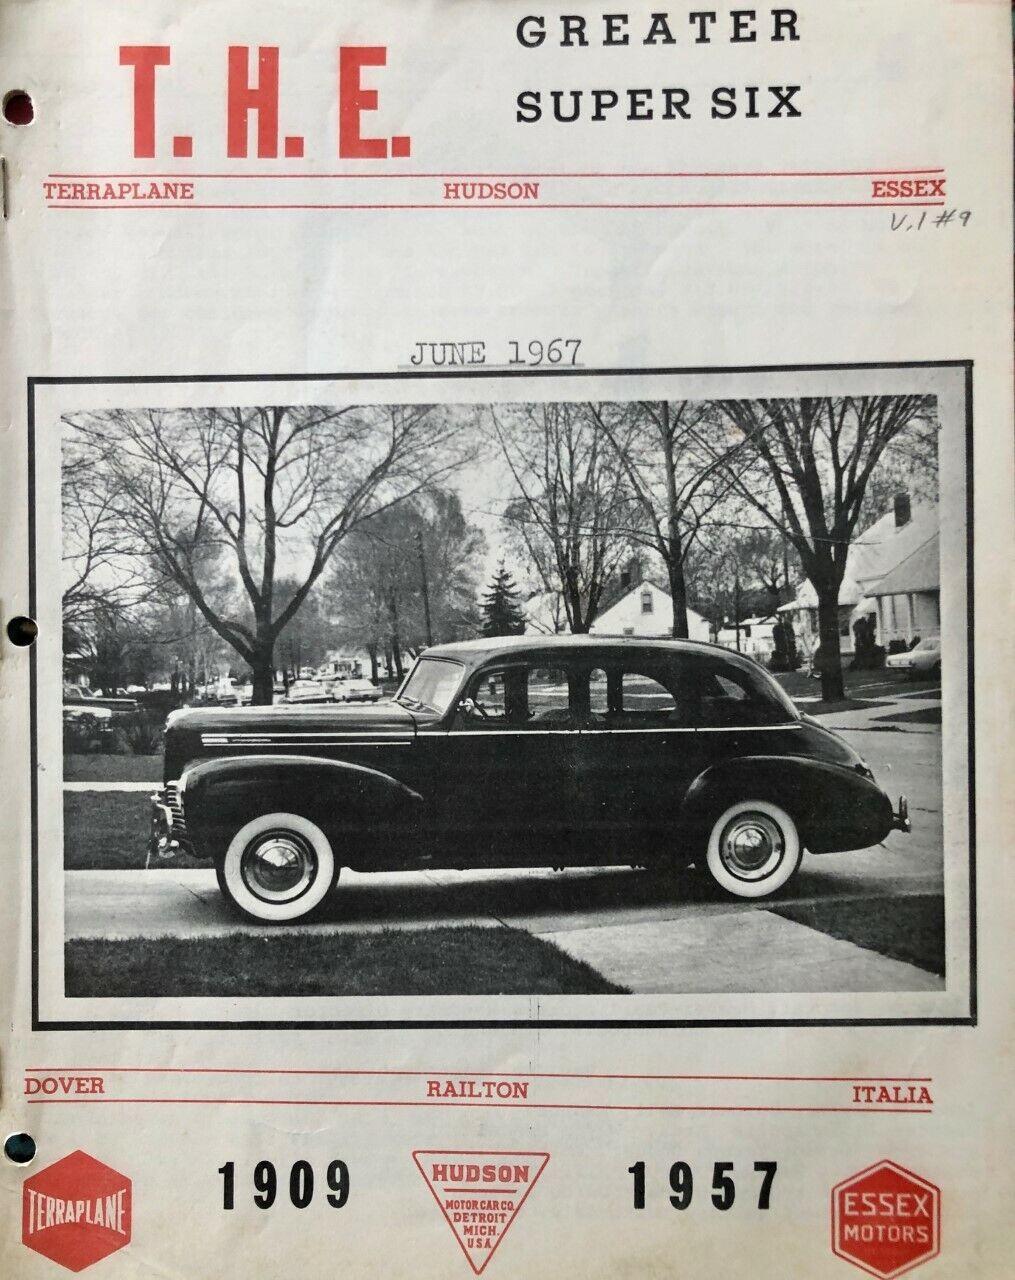 Ten 1960s THE Hudson Essex Mags 27 29 30 35 40 41 42 46 47 48 49 50 51 52 53 54